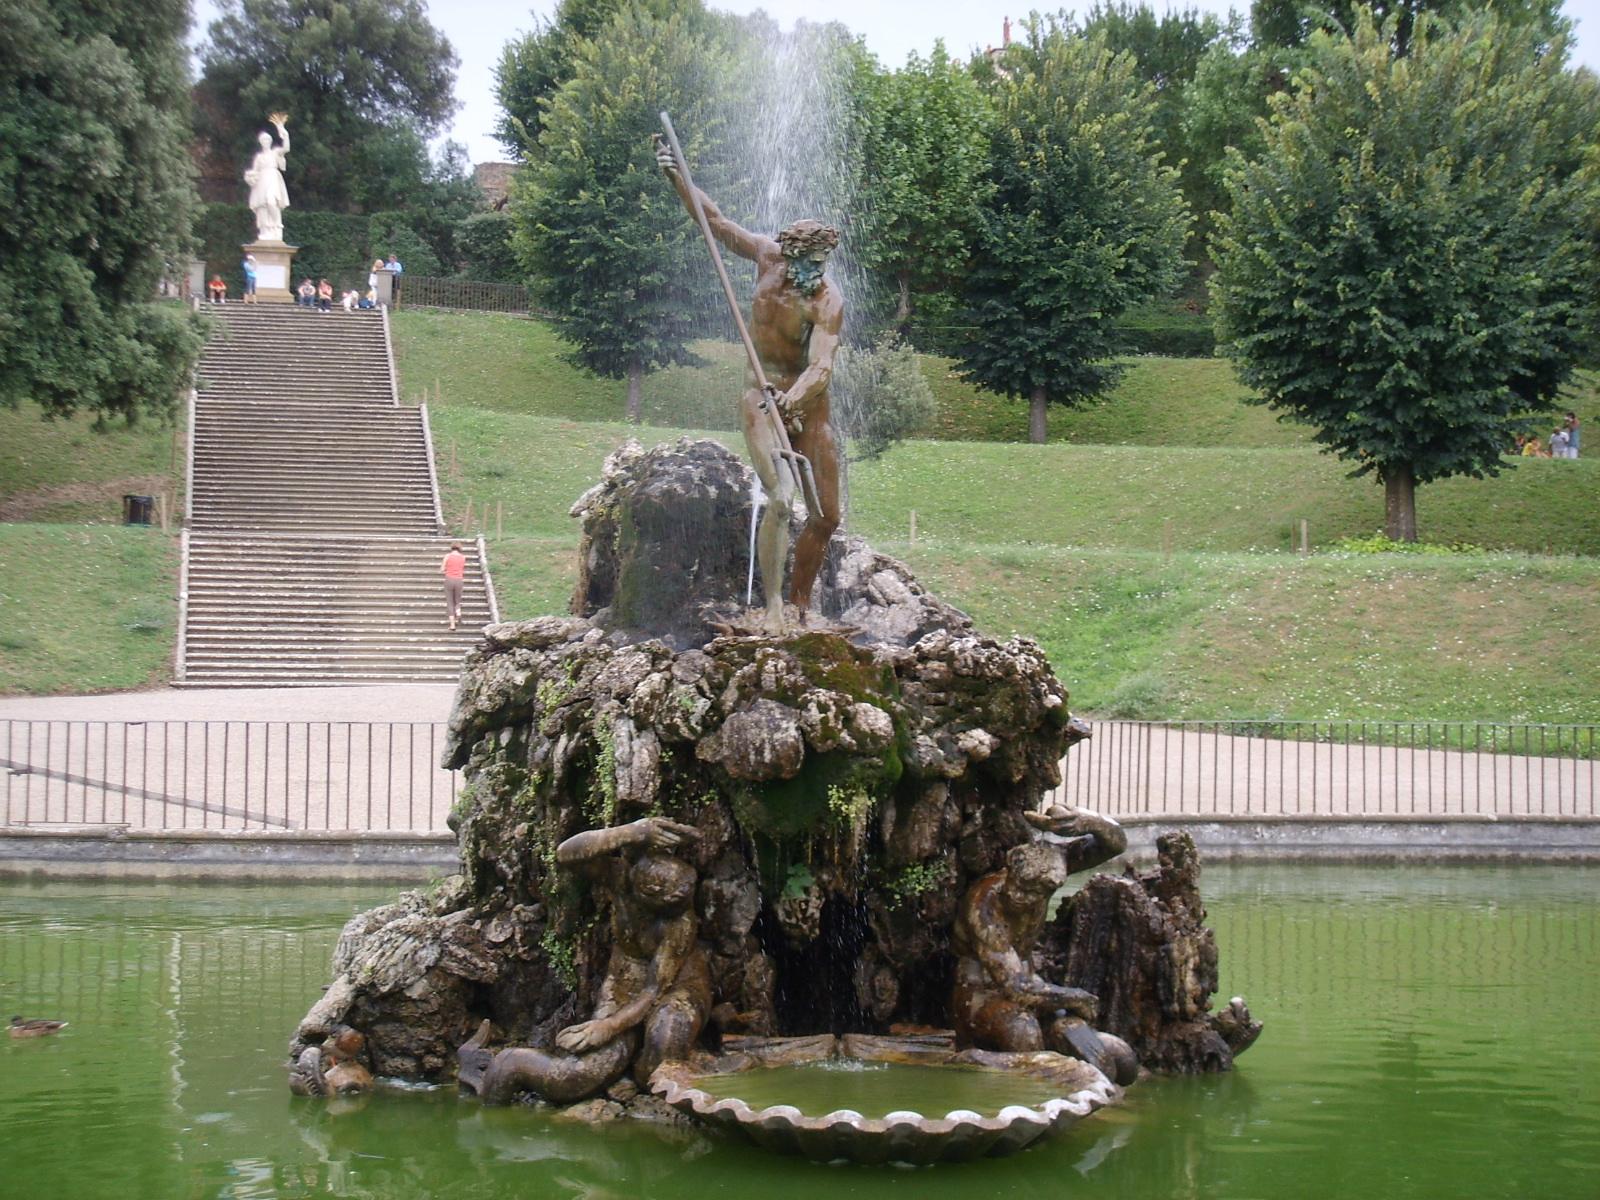 Fontana Giardino Pietra : File:boboli fontana del tritone stoldo lorenzi 03.jpg wikipedia